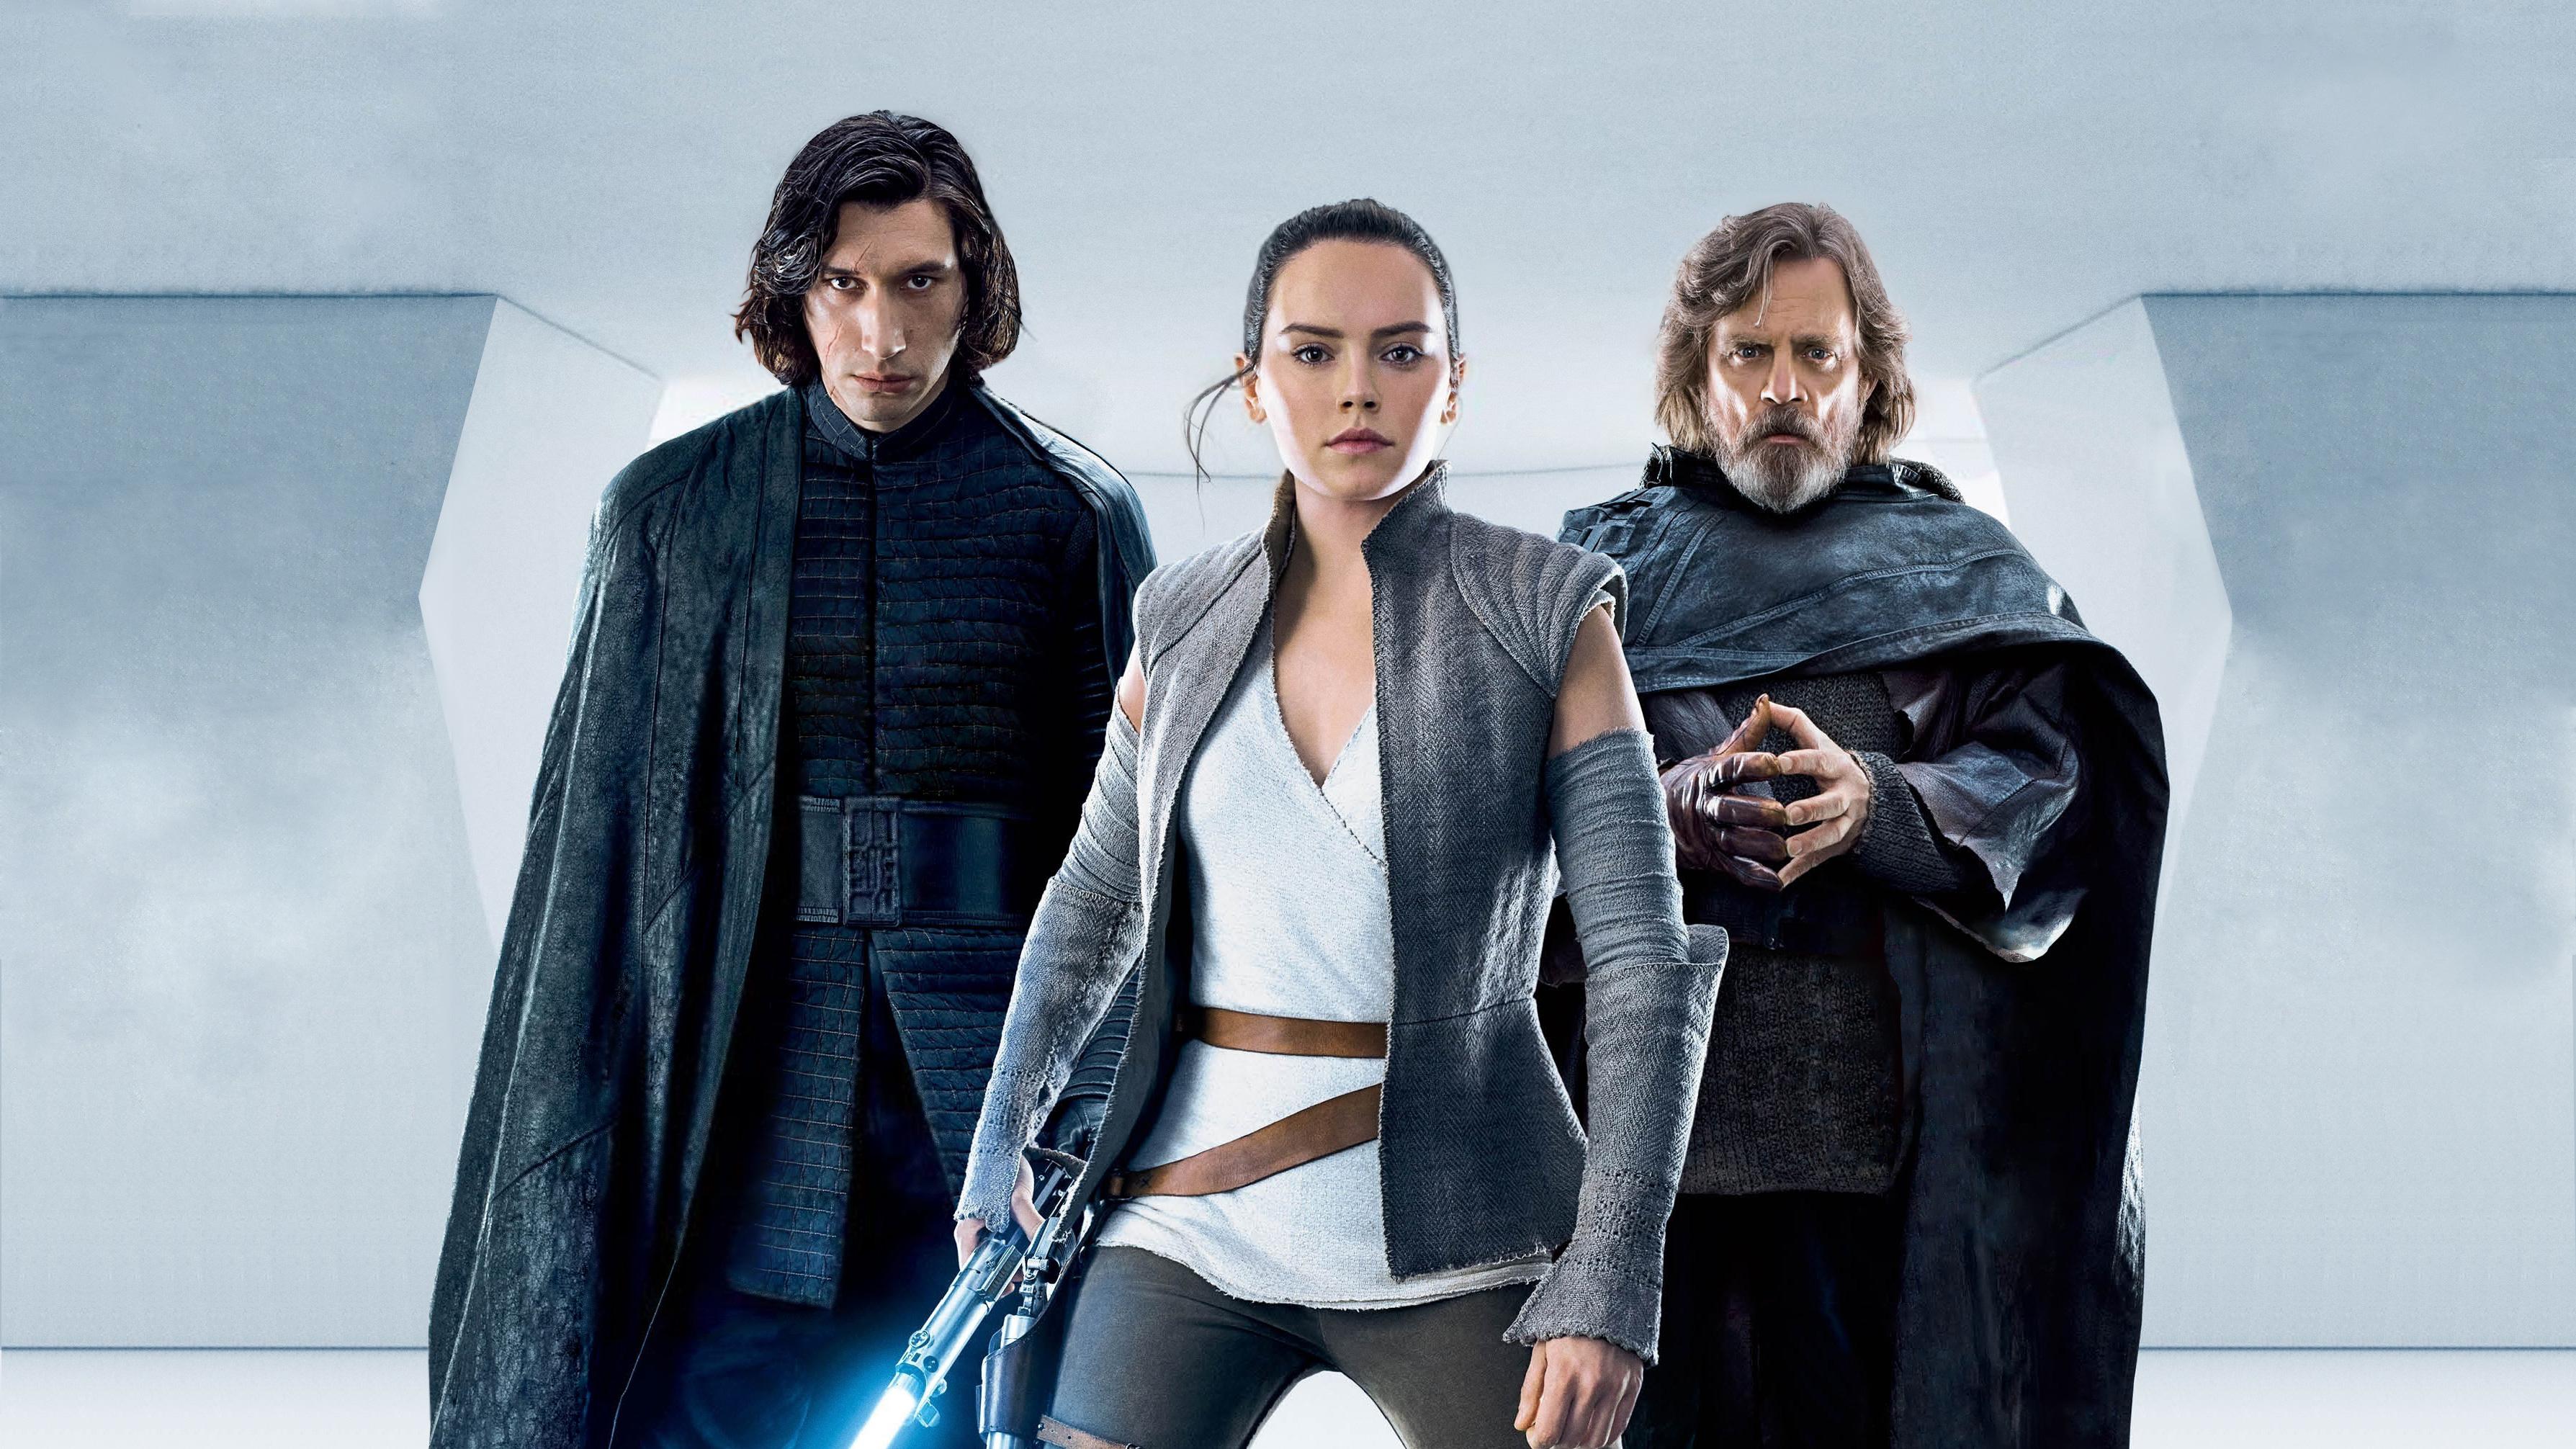 Most Inspiring Wallpaper Movie Rey - kylo-ren-rey-luke-skywalker-in-star-wars-the-last-jedi-8d  You Should Have_902498.jpg